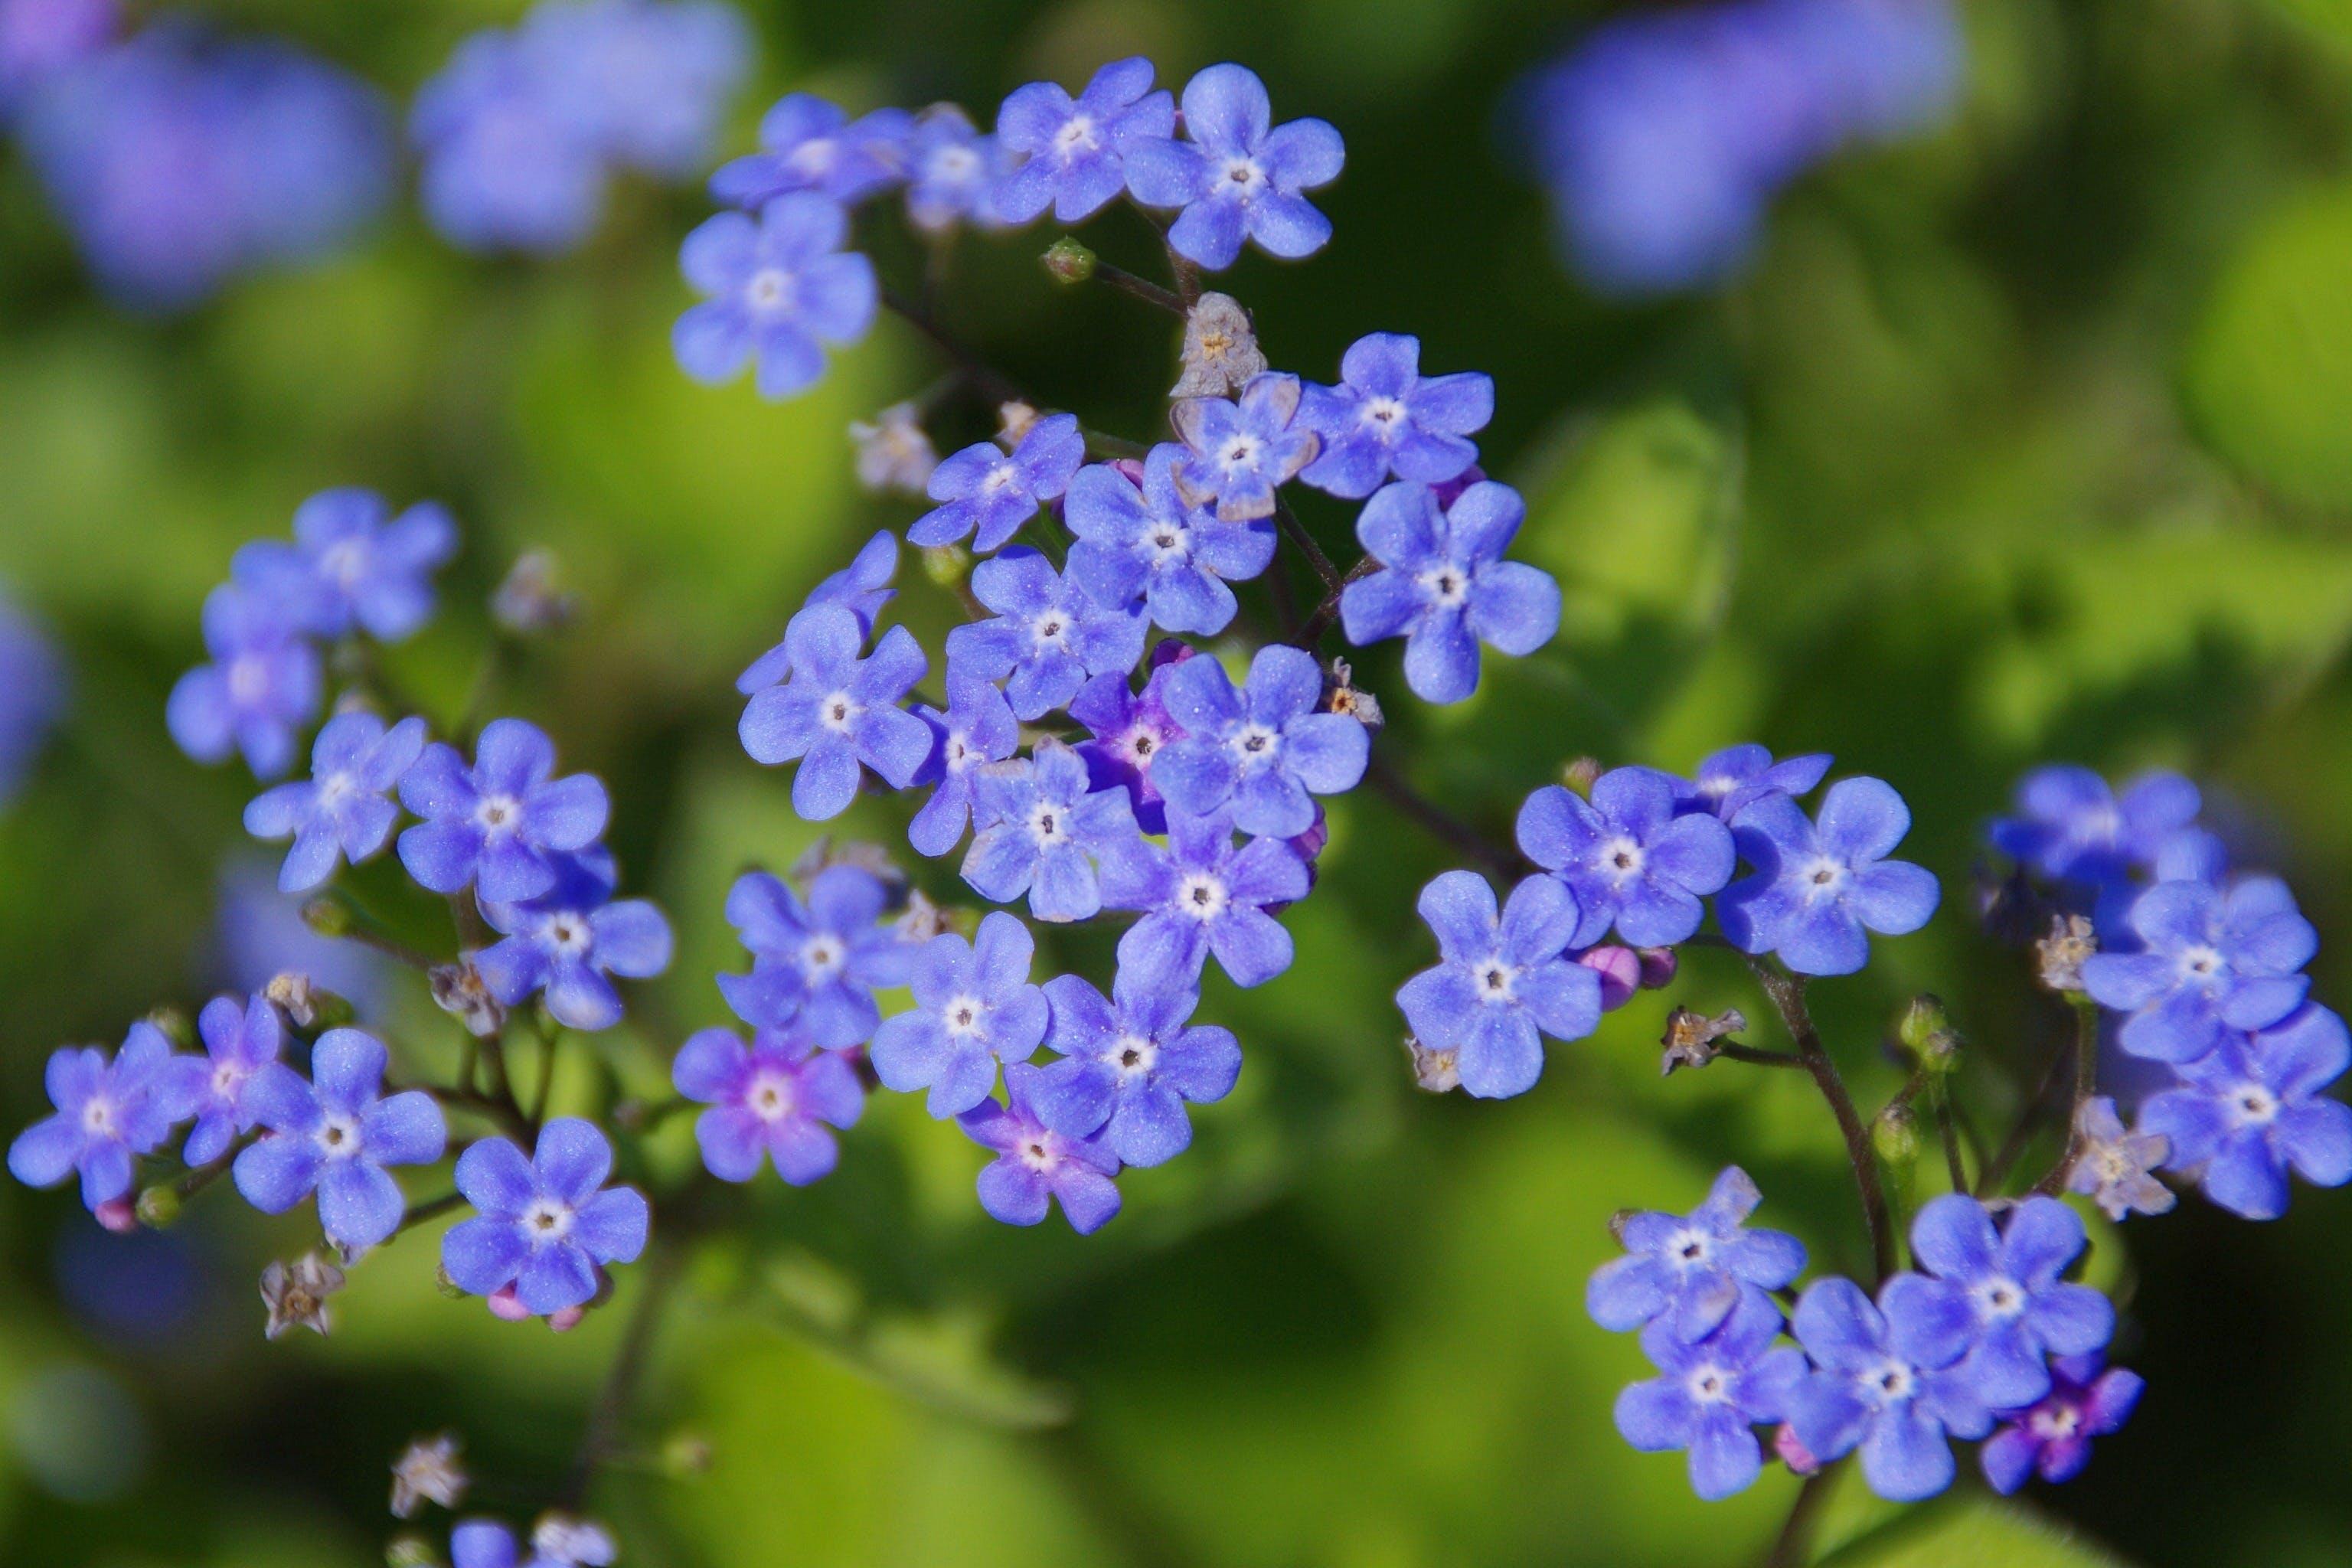 Photo of Purple 5 Petal Flower on Brown Stem during Daytime